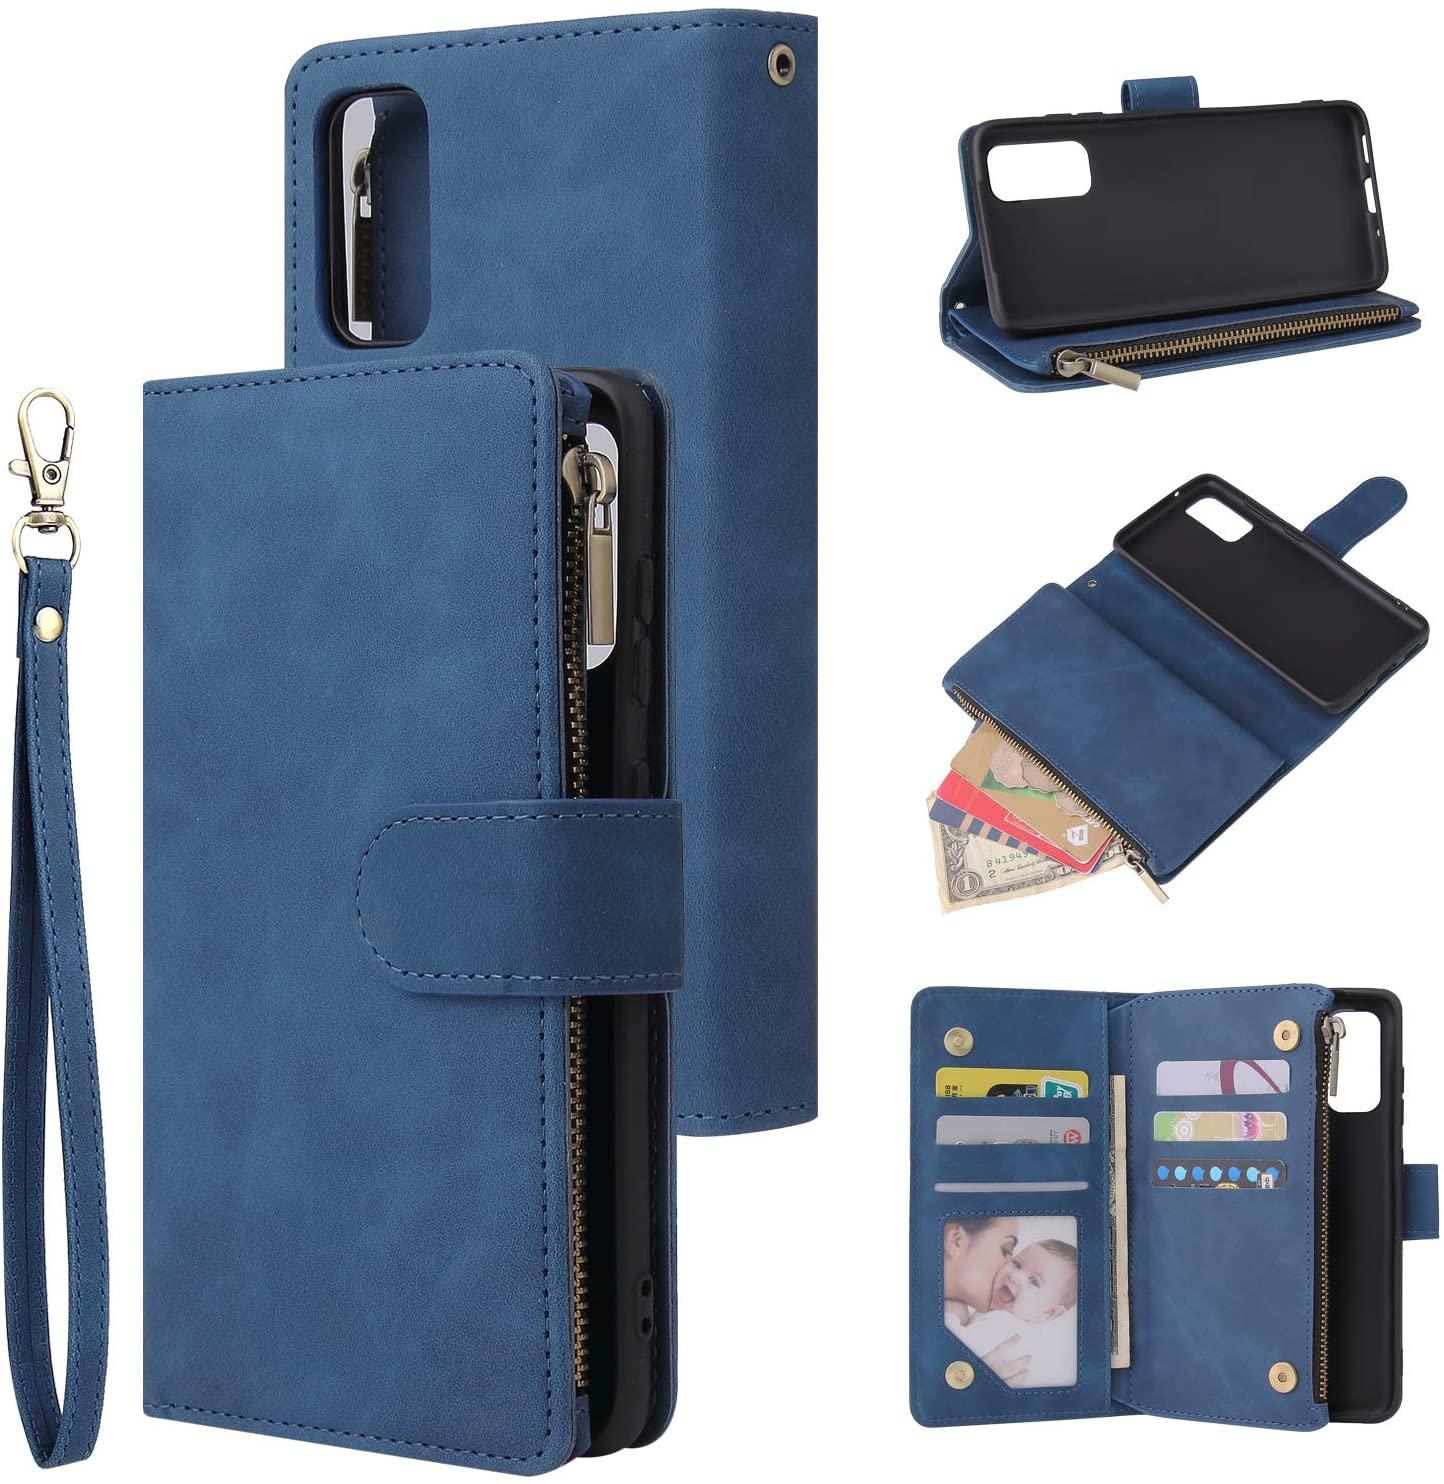 UEEBAI Wallet Case for Samsung Galaxy S20 Plus, Premium Vintage PU Leather Magnetic Closure Handbag Zipper Pocket Case Kickstand Card Holder Slots with Wrist Strap TPU Shockproof Flip Cover - Blue